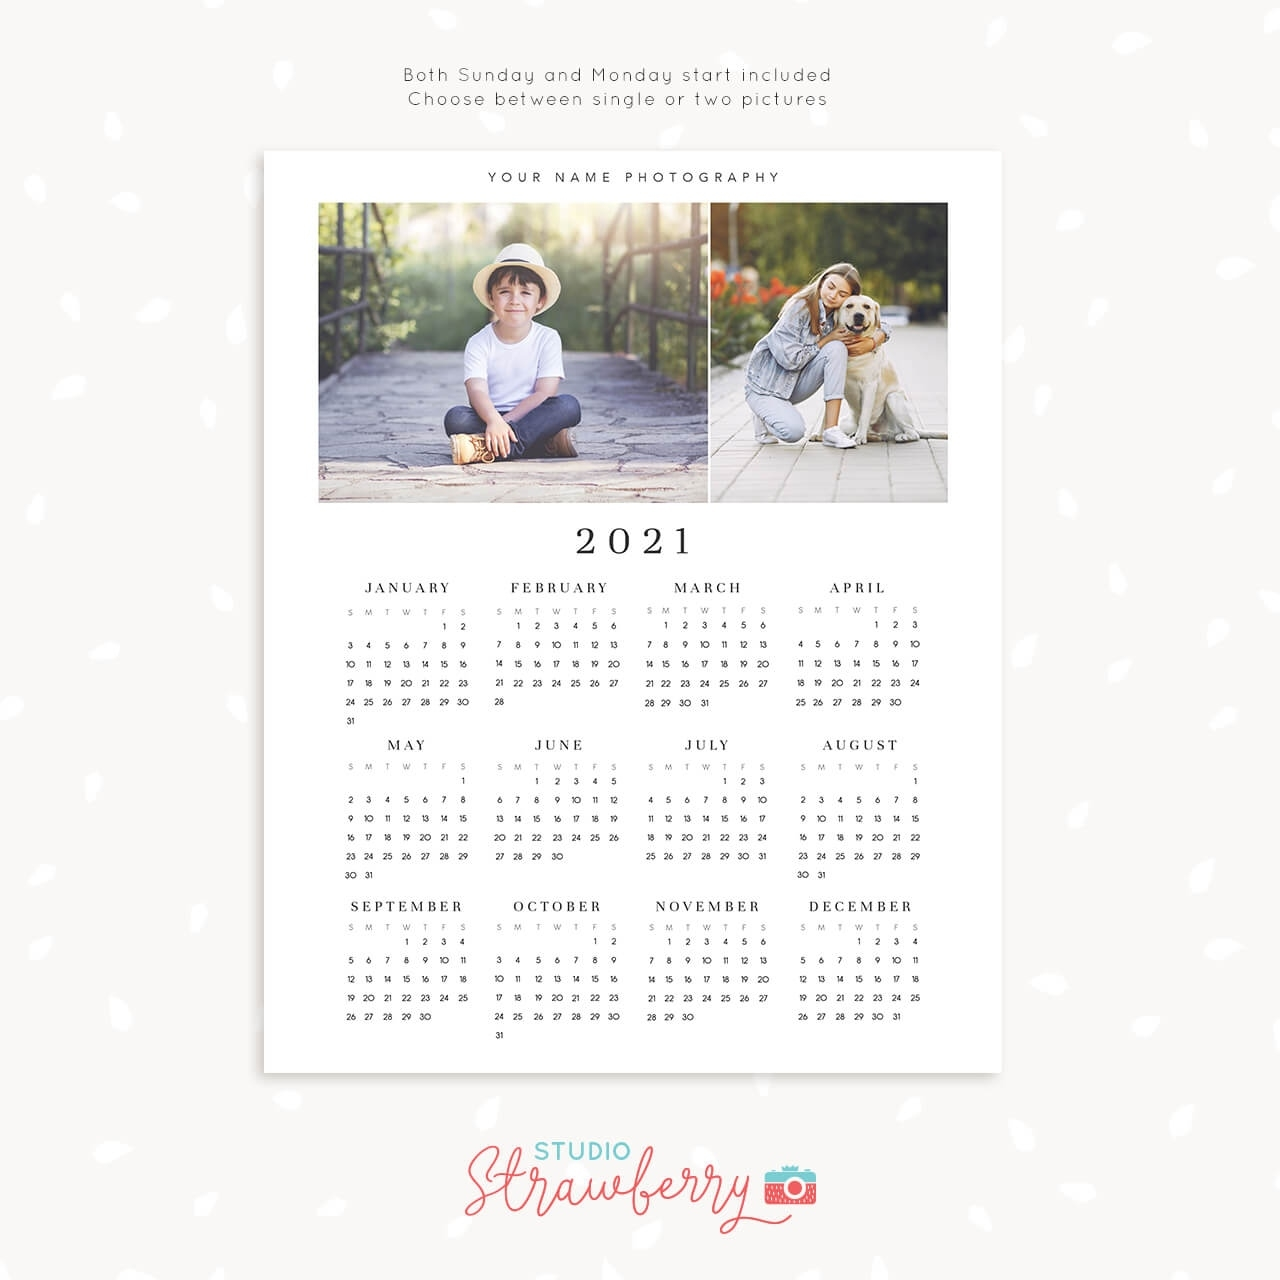 2021 Photo Calendar Template | One Page Printable Calendar 1 Page Calendar Template